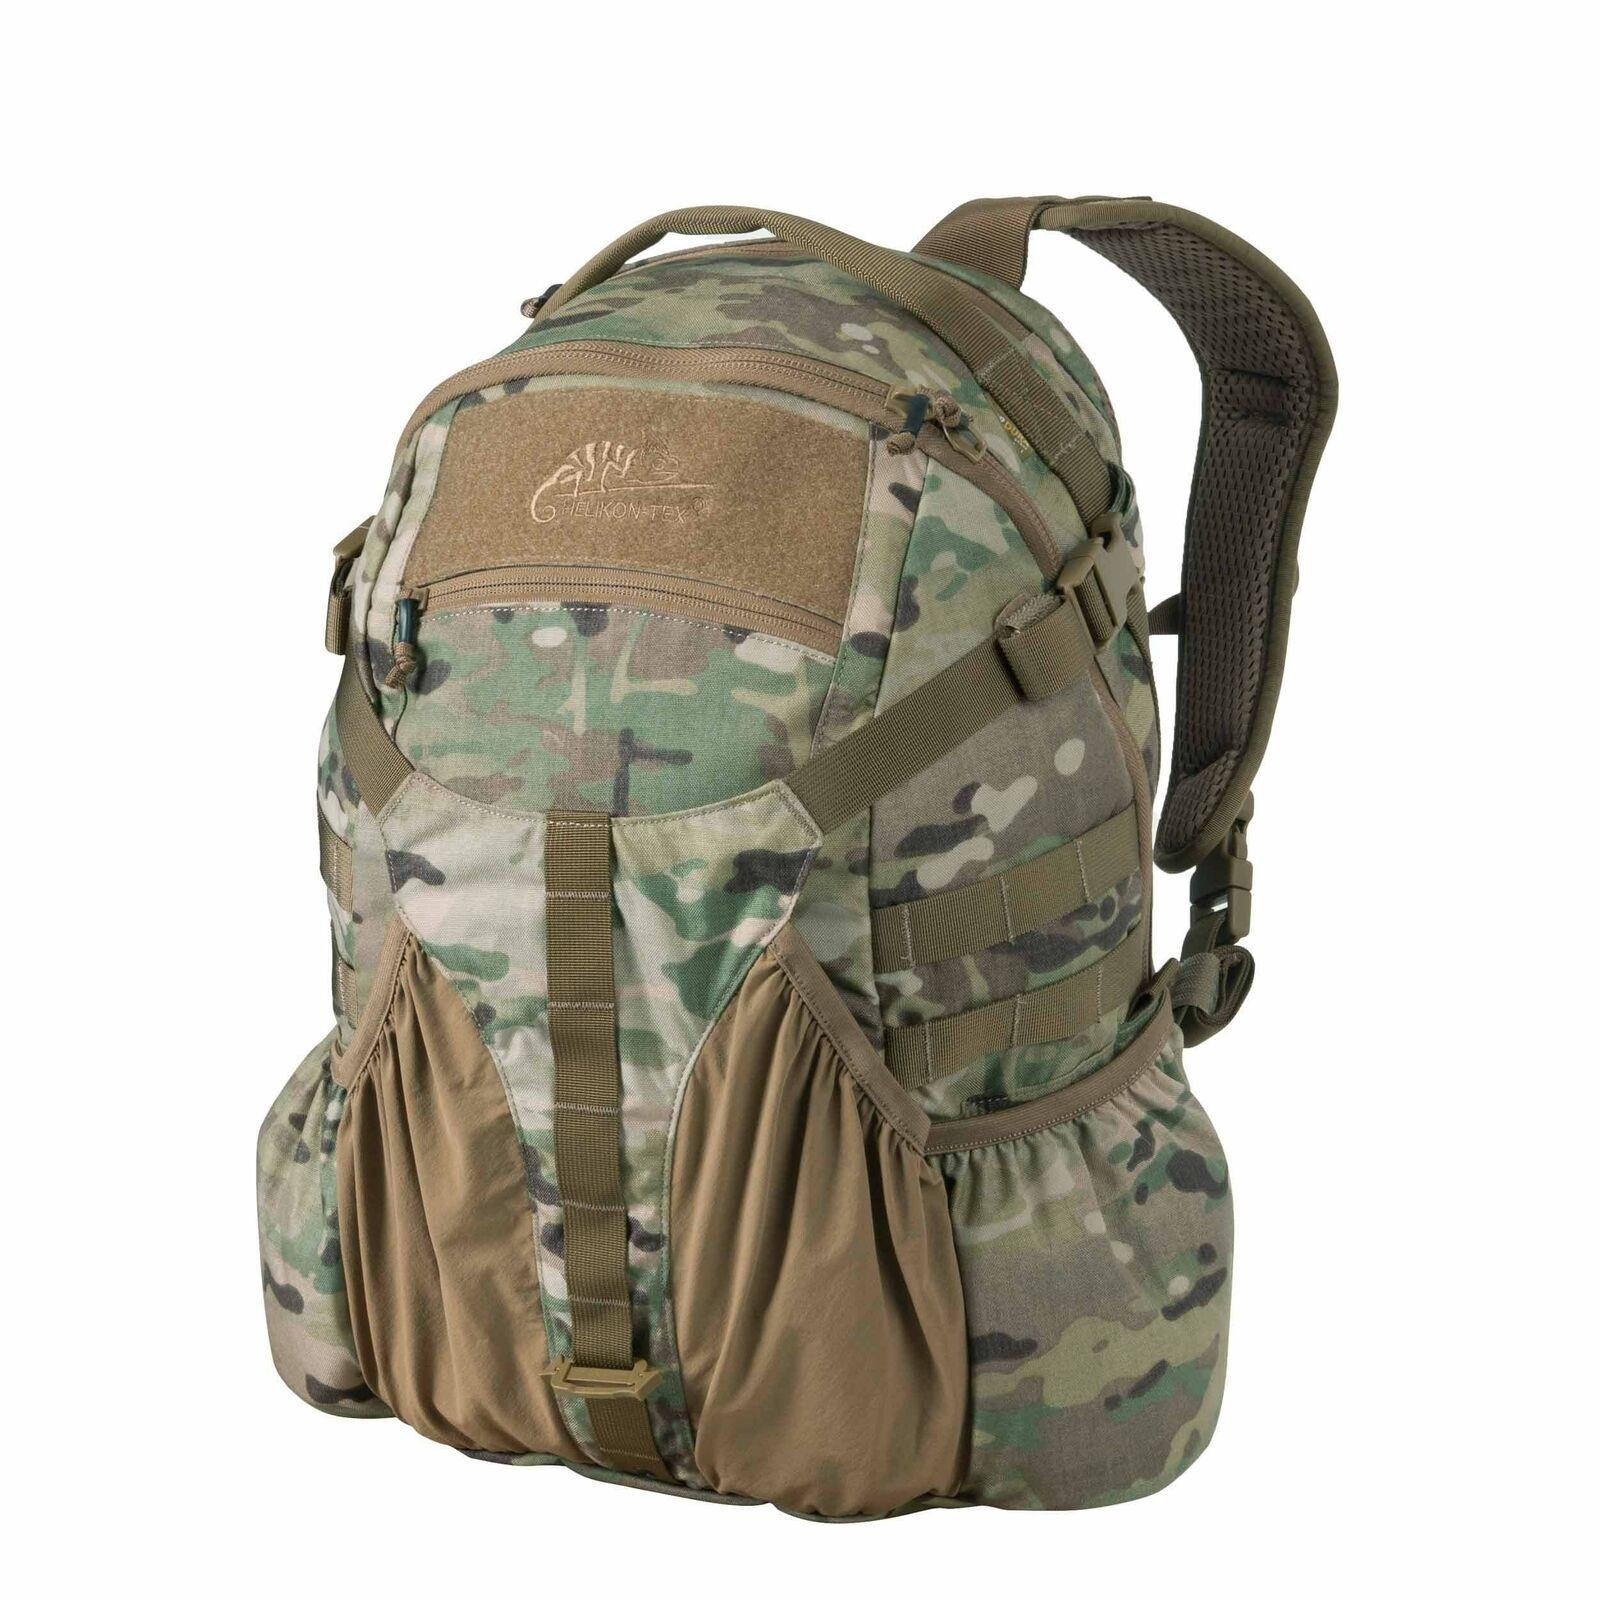 Helikon-Tex Raider Rucksack Multicam Backpack 20 Liter